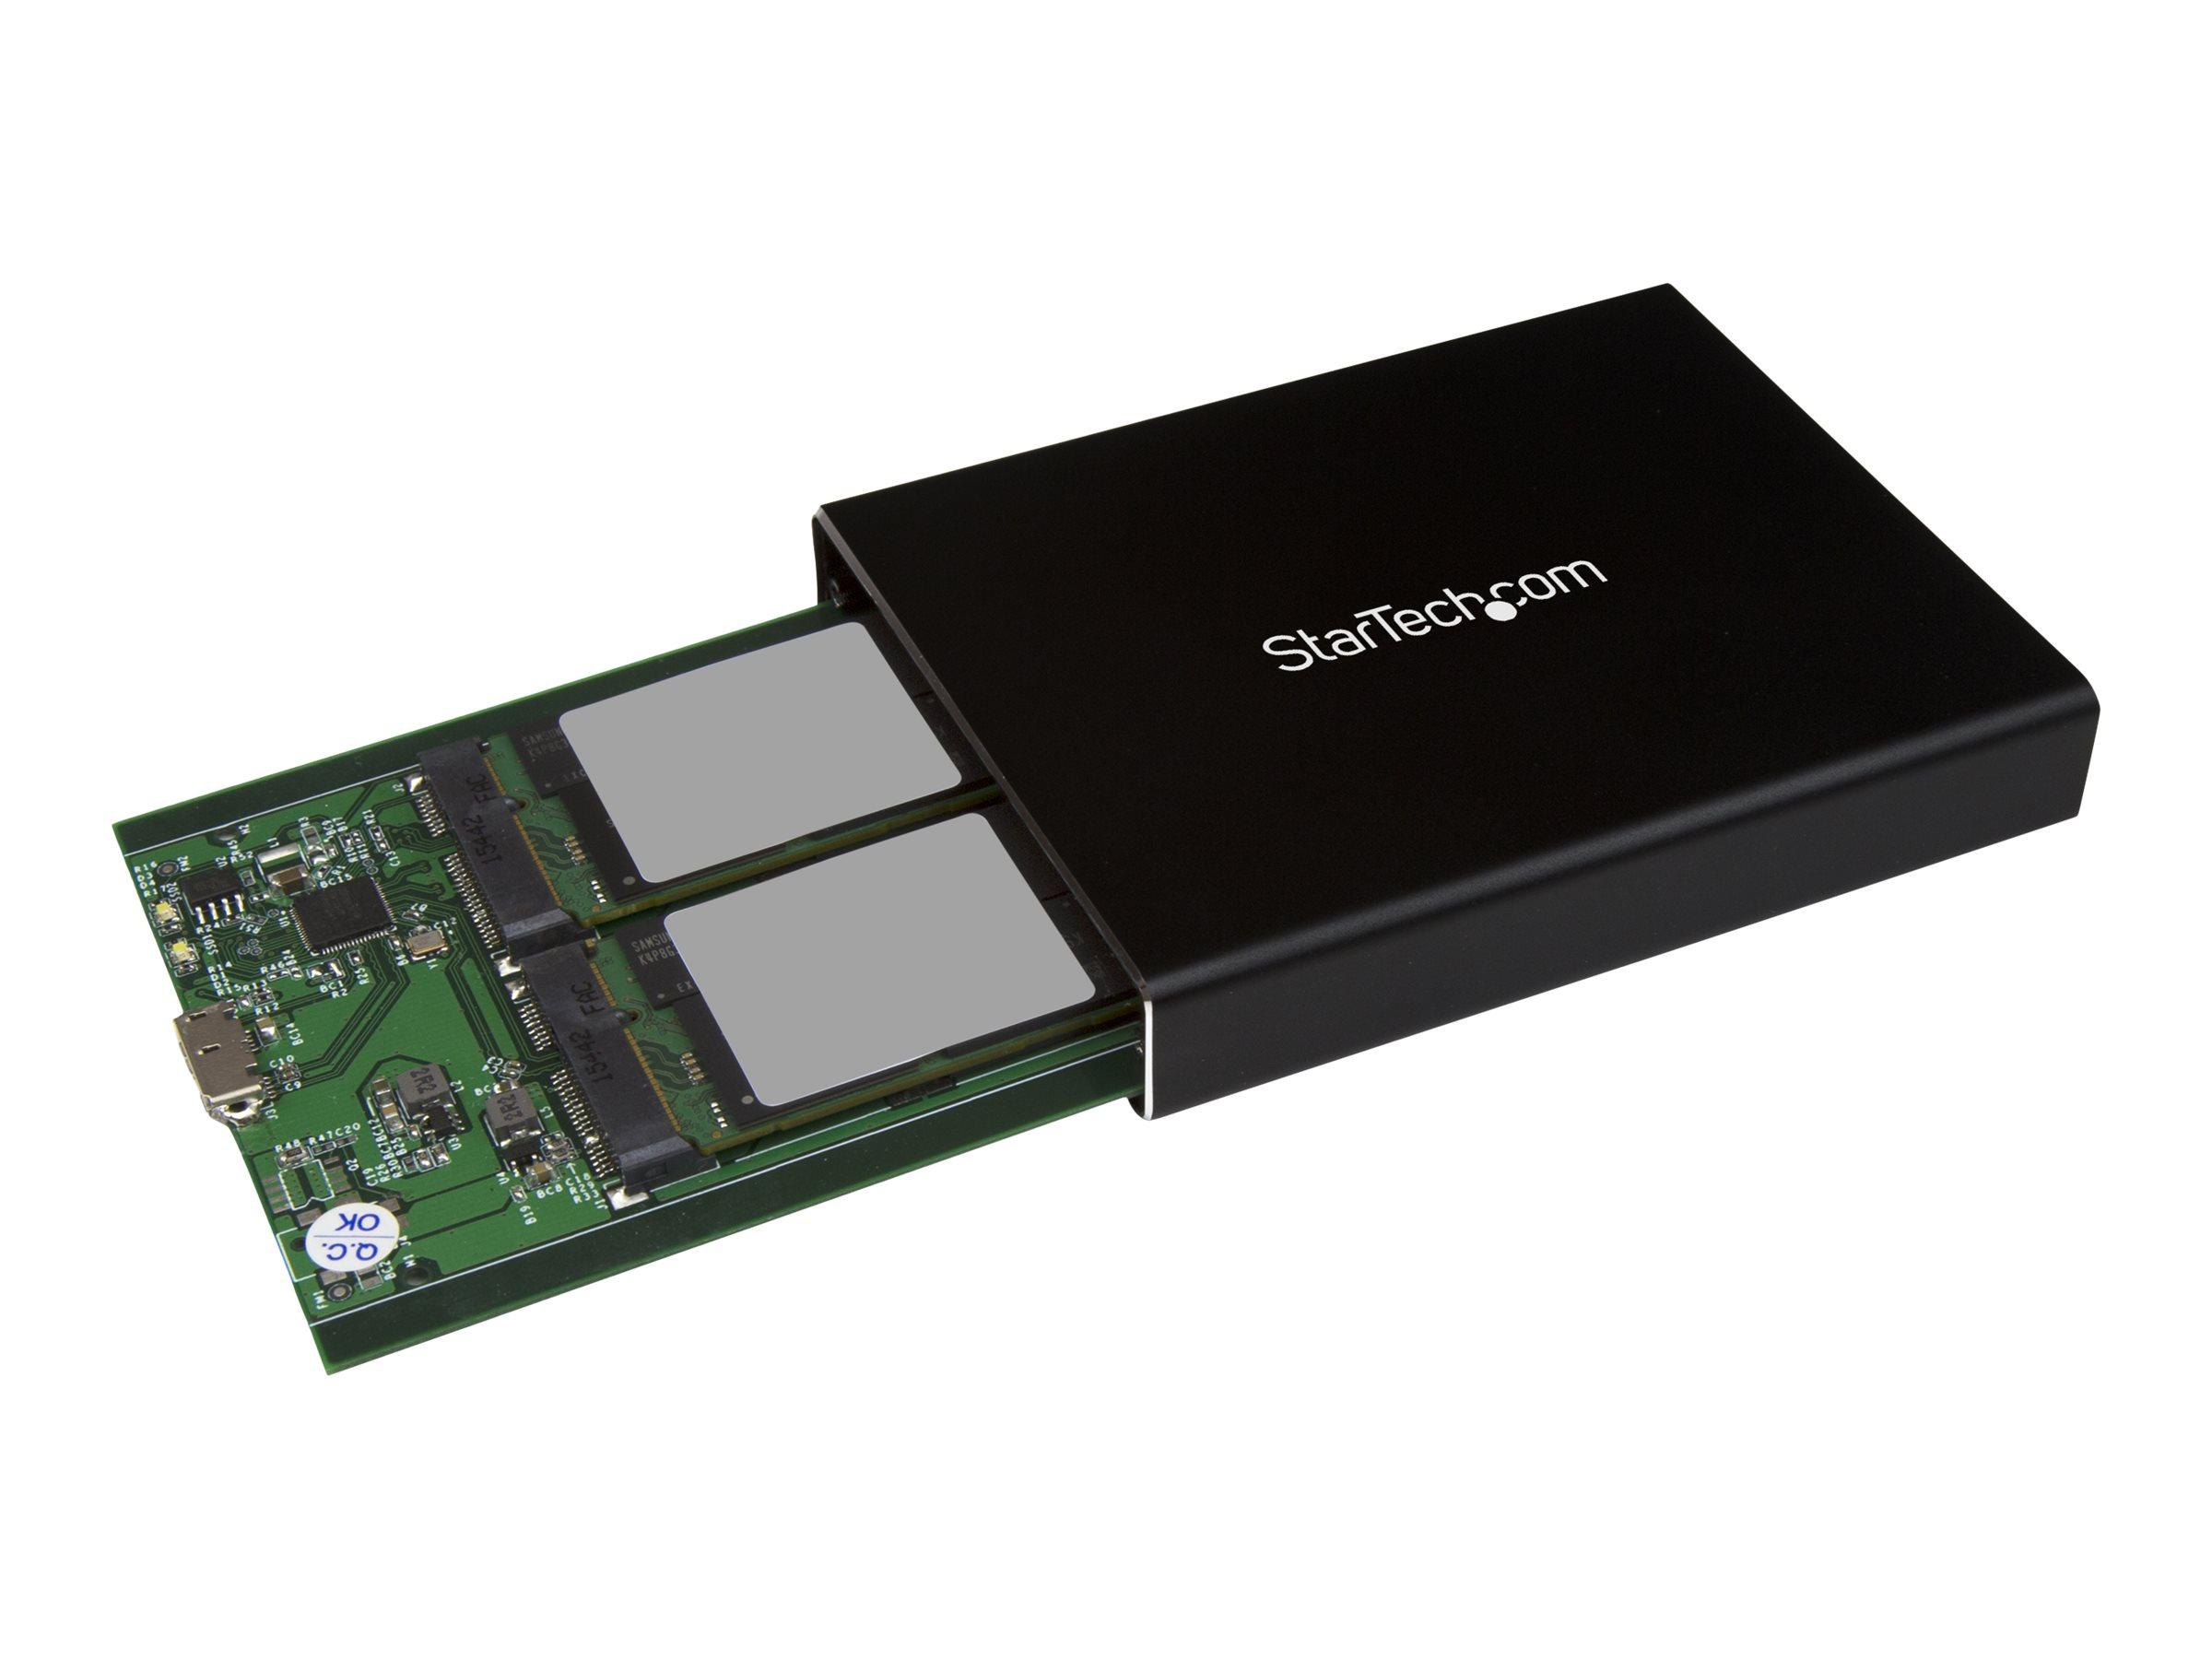 StarTech.com Dual mSATA Festplattengehäuse - RAID - mSATA SSD Gehäuse - USB 3.1 (10Gbit/s) - USB C / USB A Festplattengehäuse -